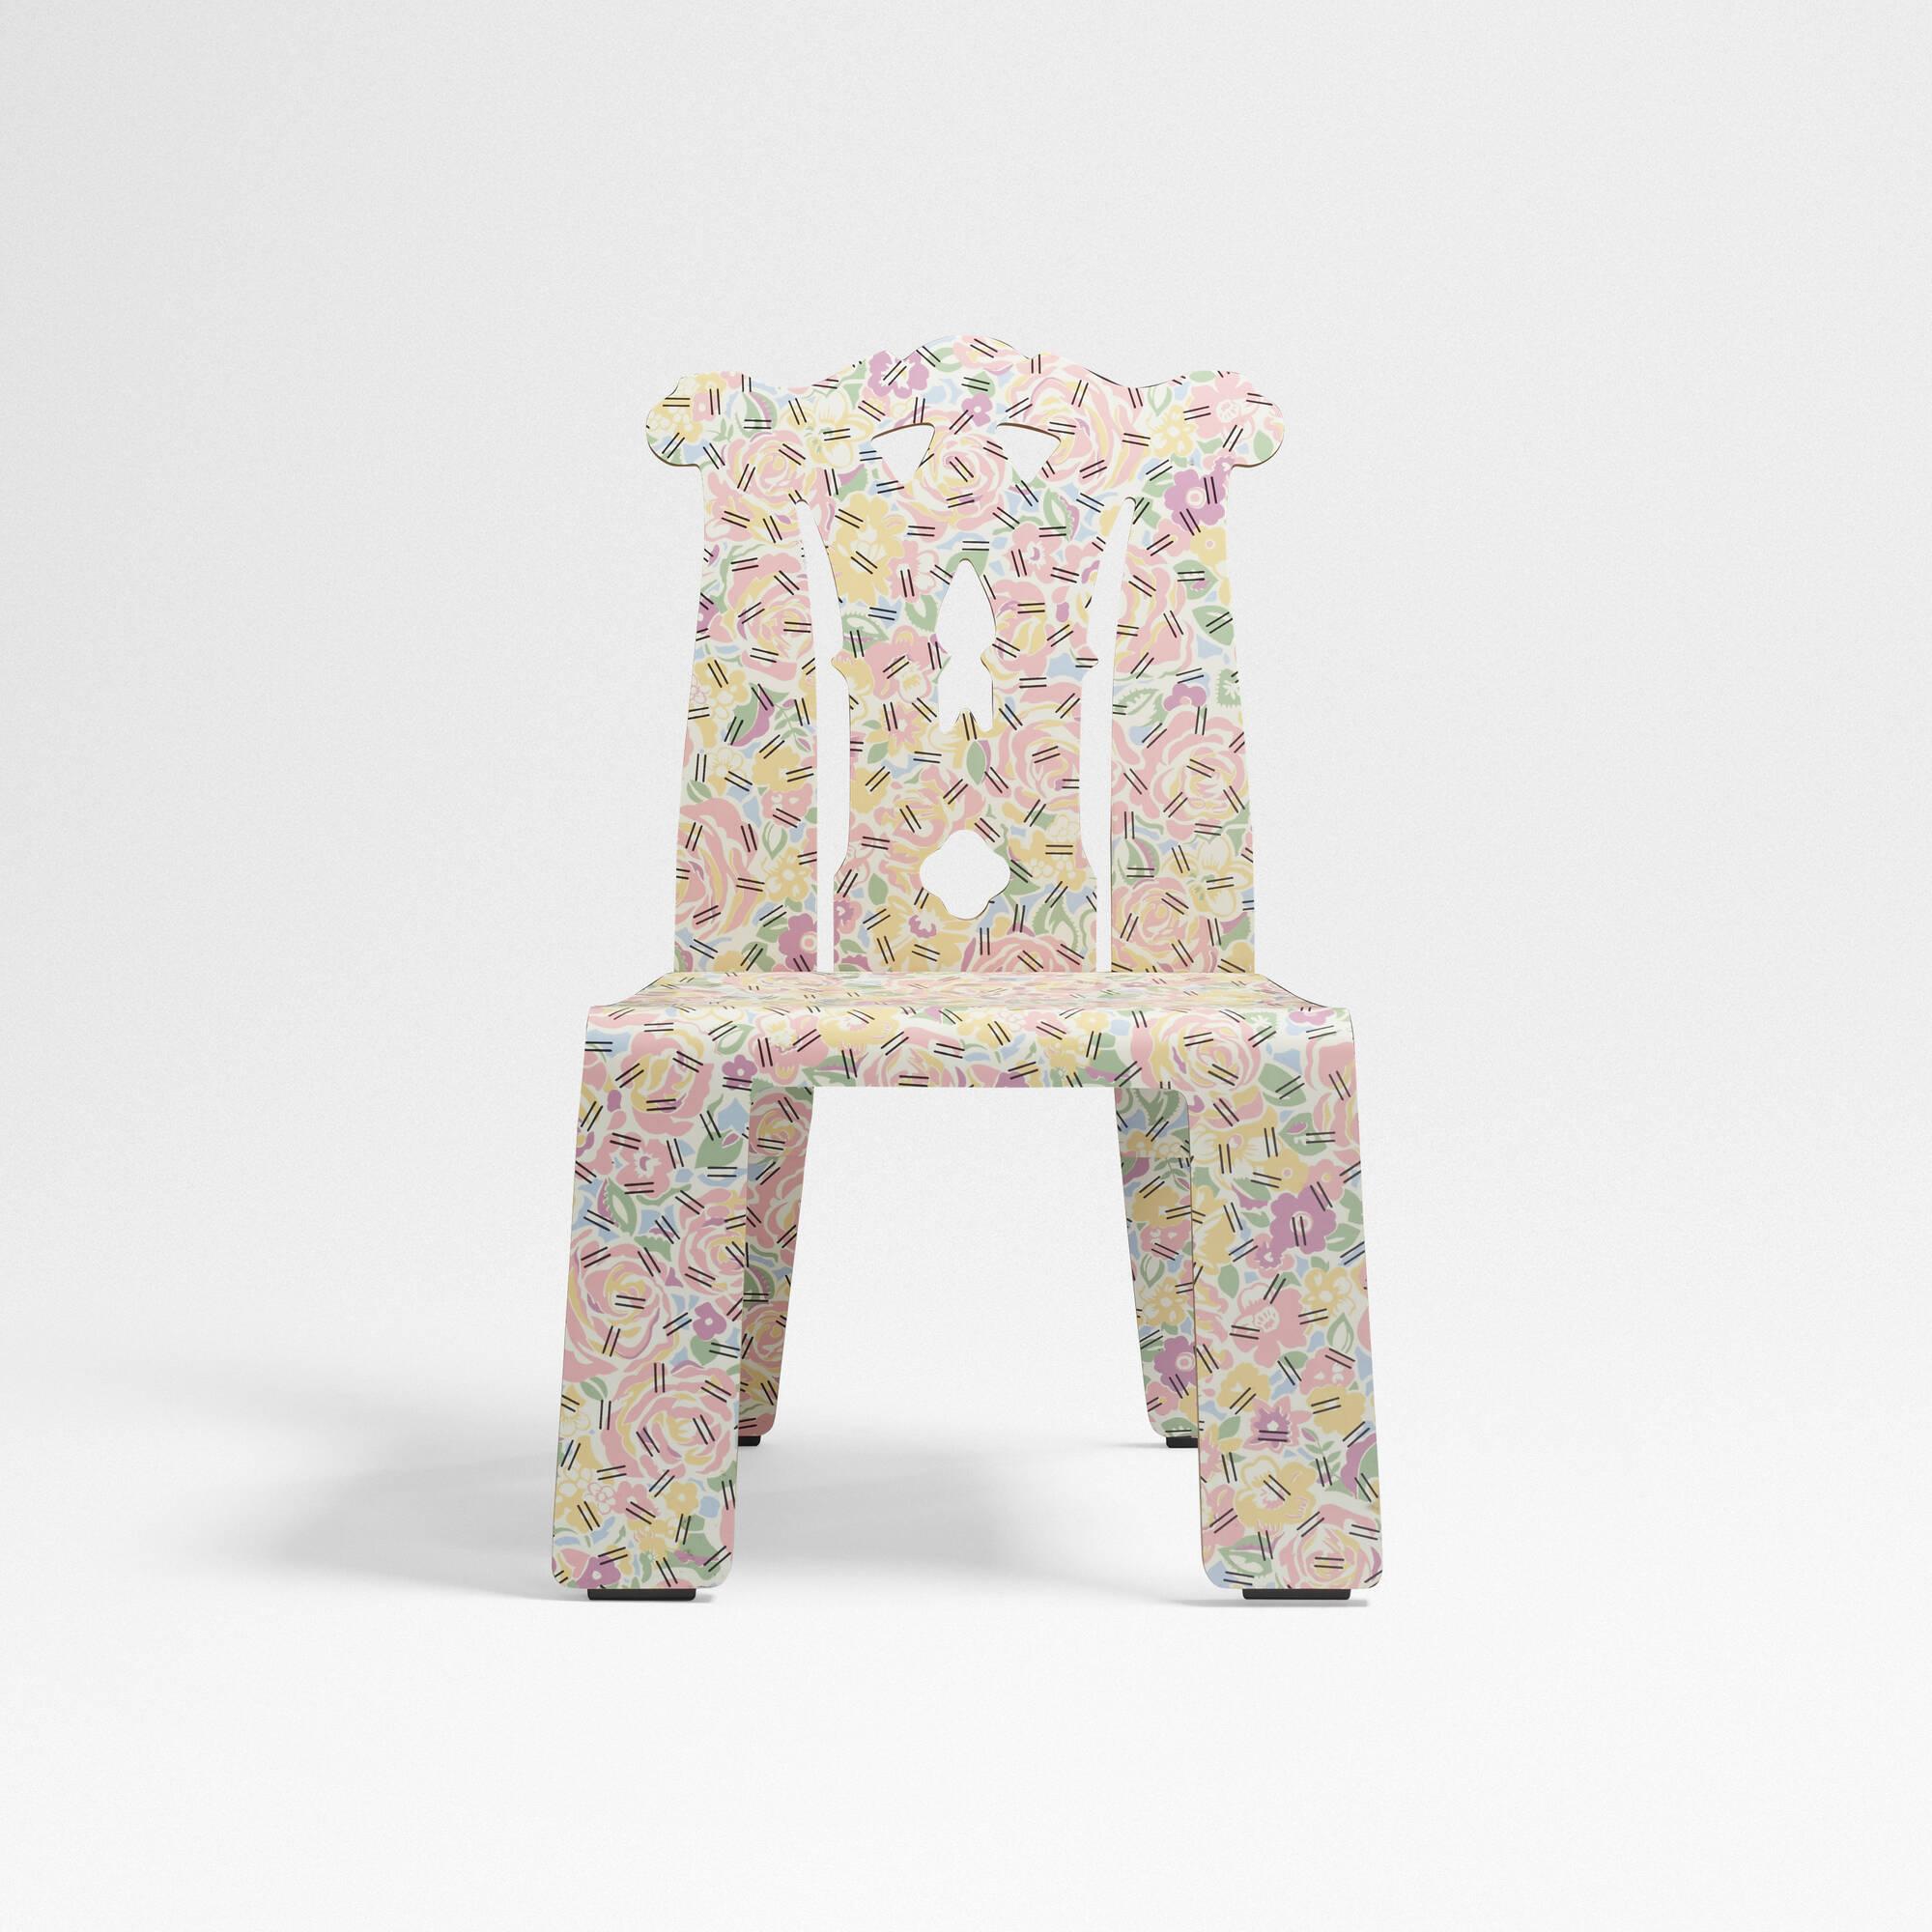 262 Robert Venturi with Denise Scott Brown / Chippendale chair (1 of 3) & 262: ROBERT VENTURI WITH DENISE SCOTT BROWN Chippendale chair ...